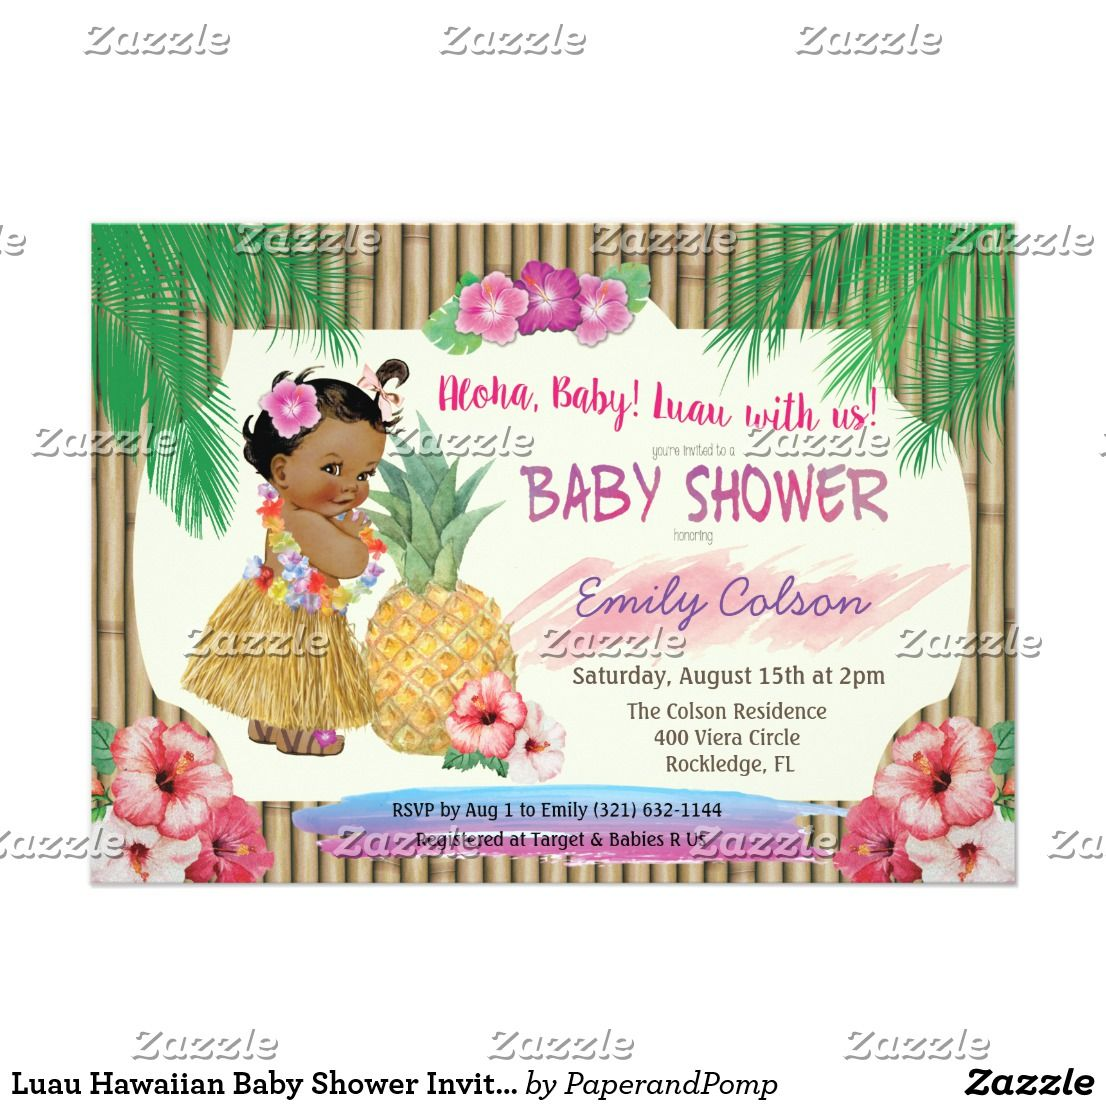 Luau Hawaiian Baby Shower Invitation   Baby Shower   Pinterest ...